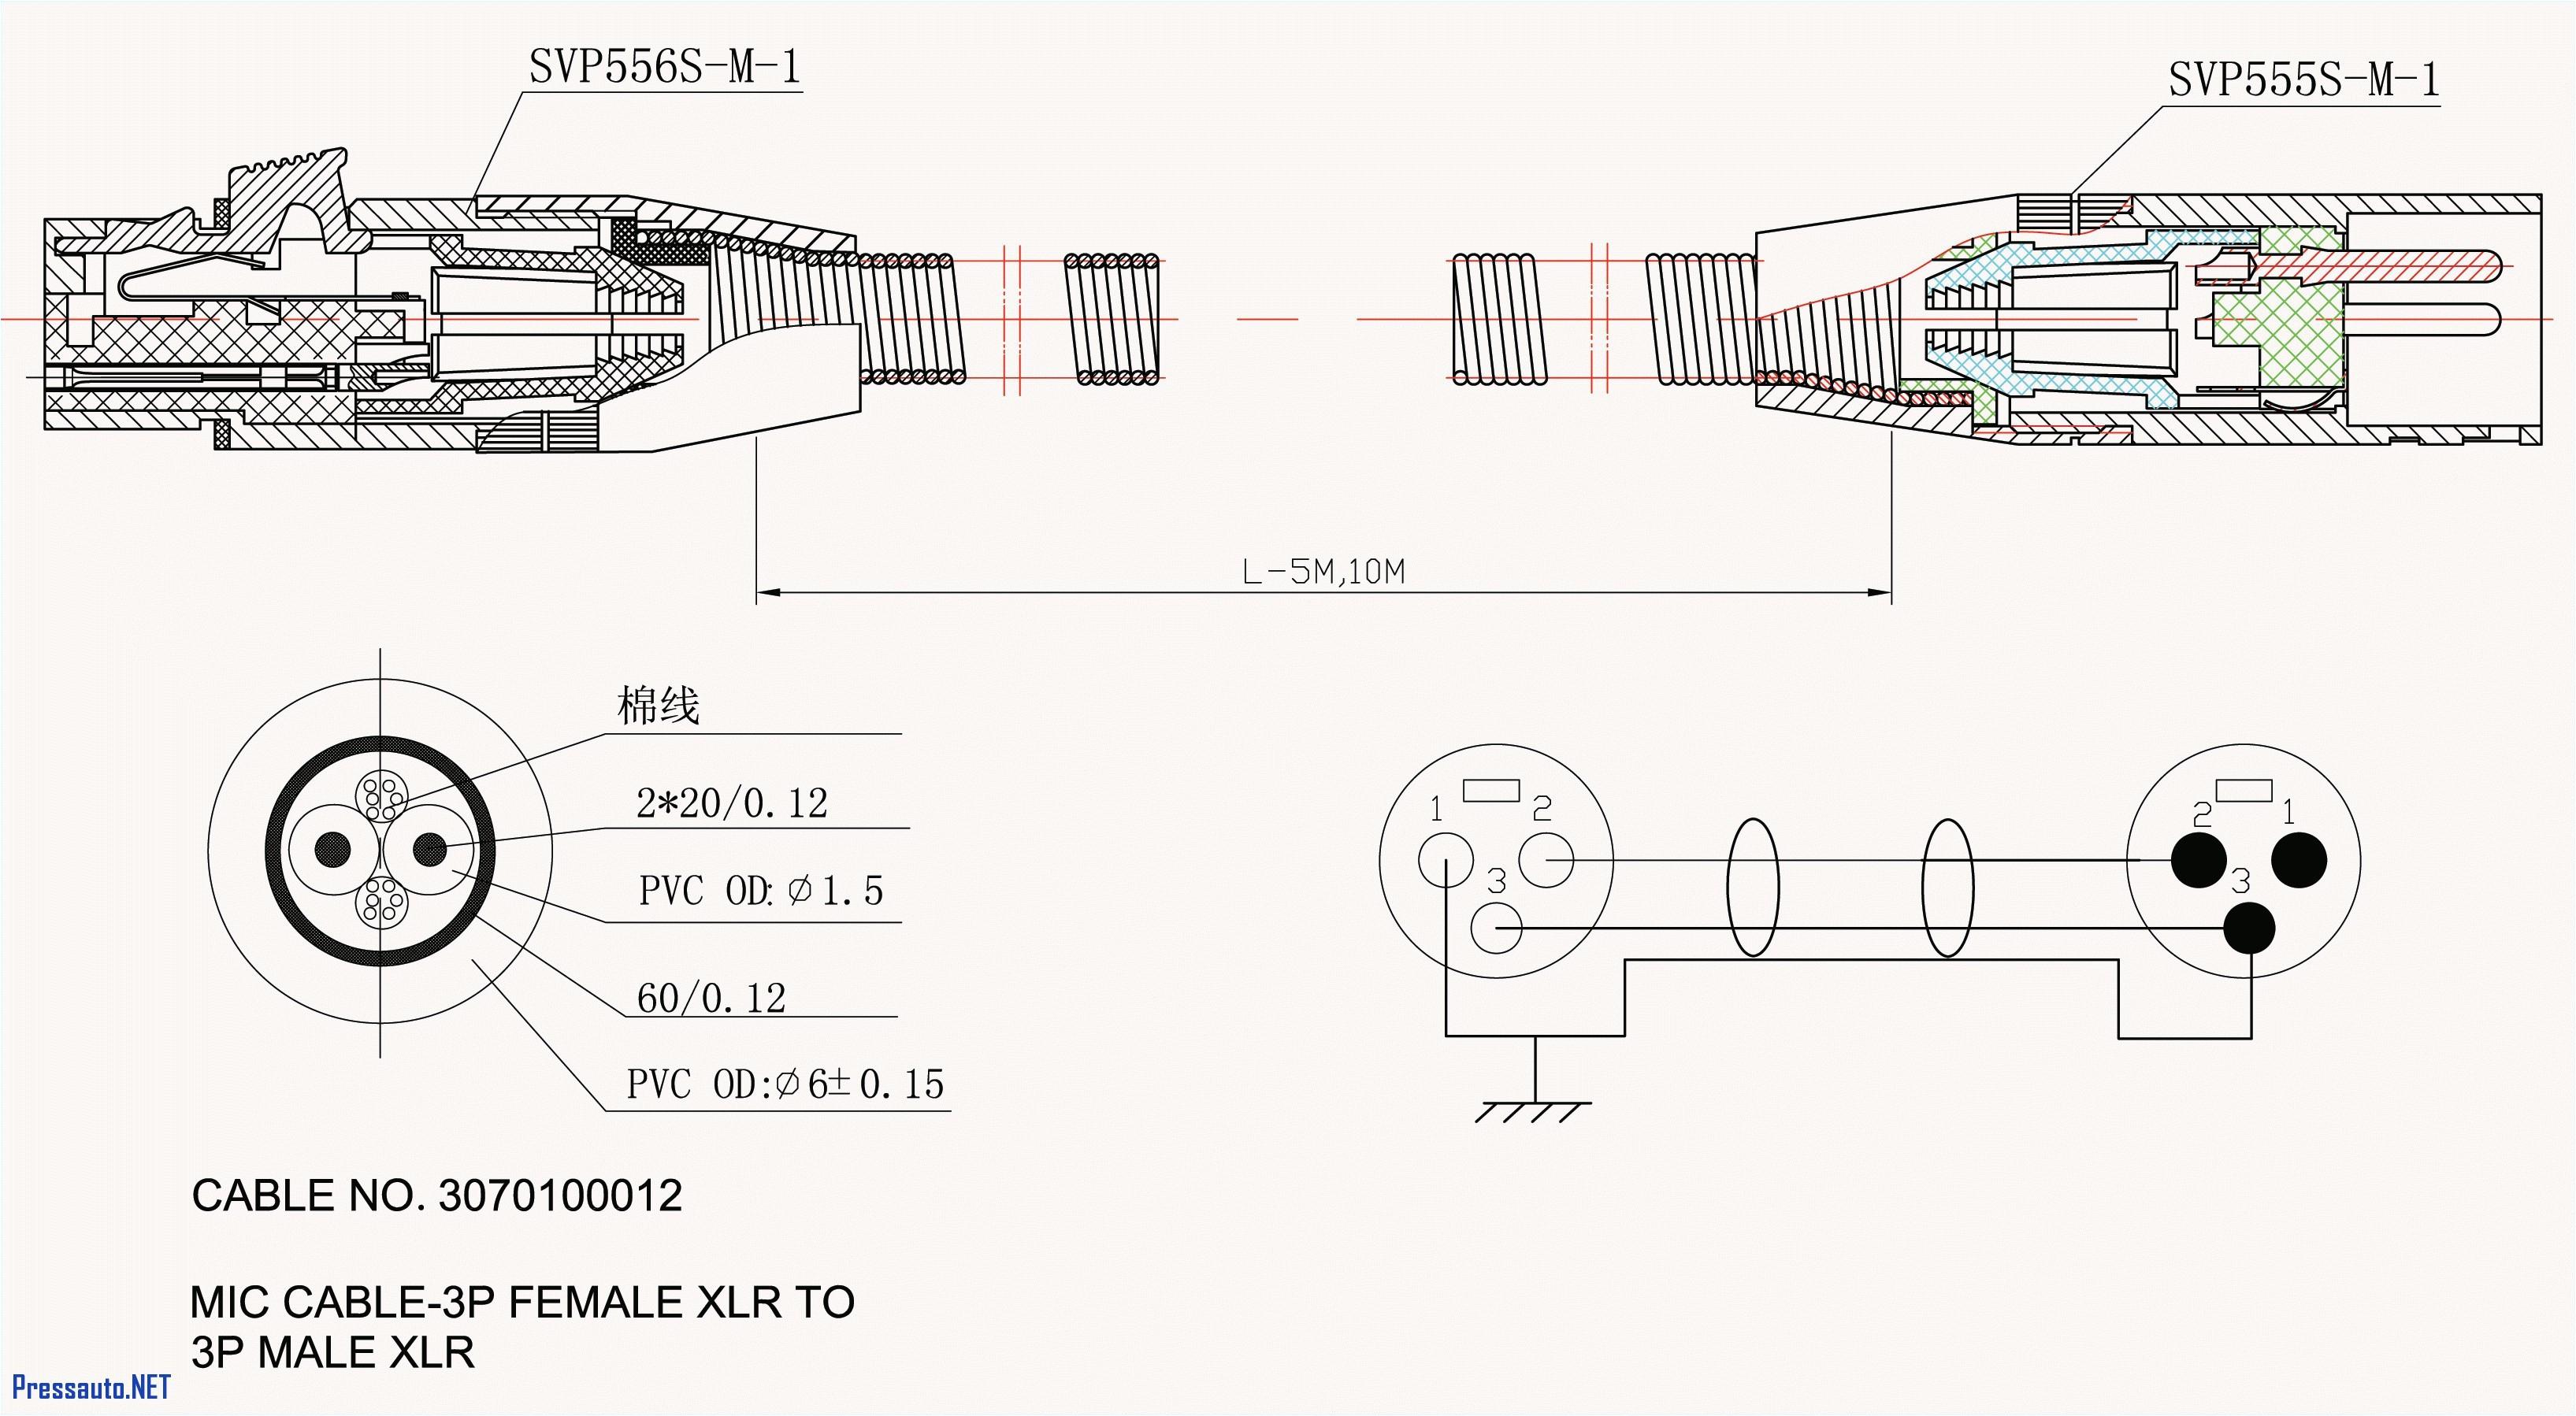 2 4 engine diagram for pvc wiring diagrams second 2004 dodgestratis se 2 4 engine diagram